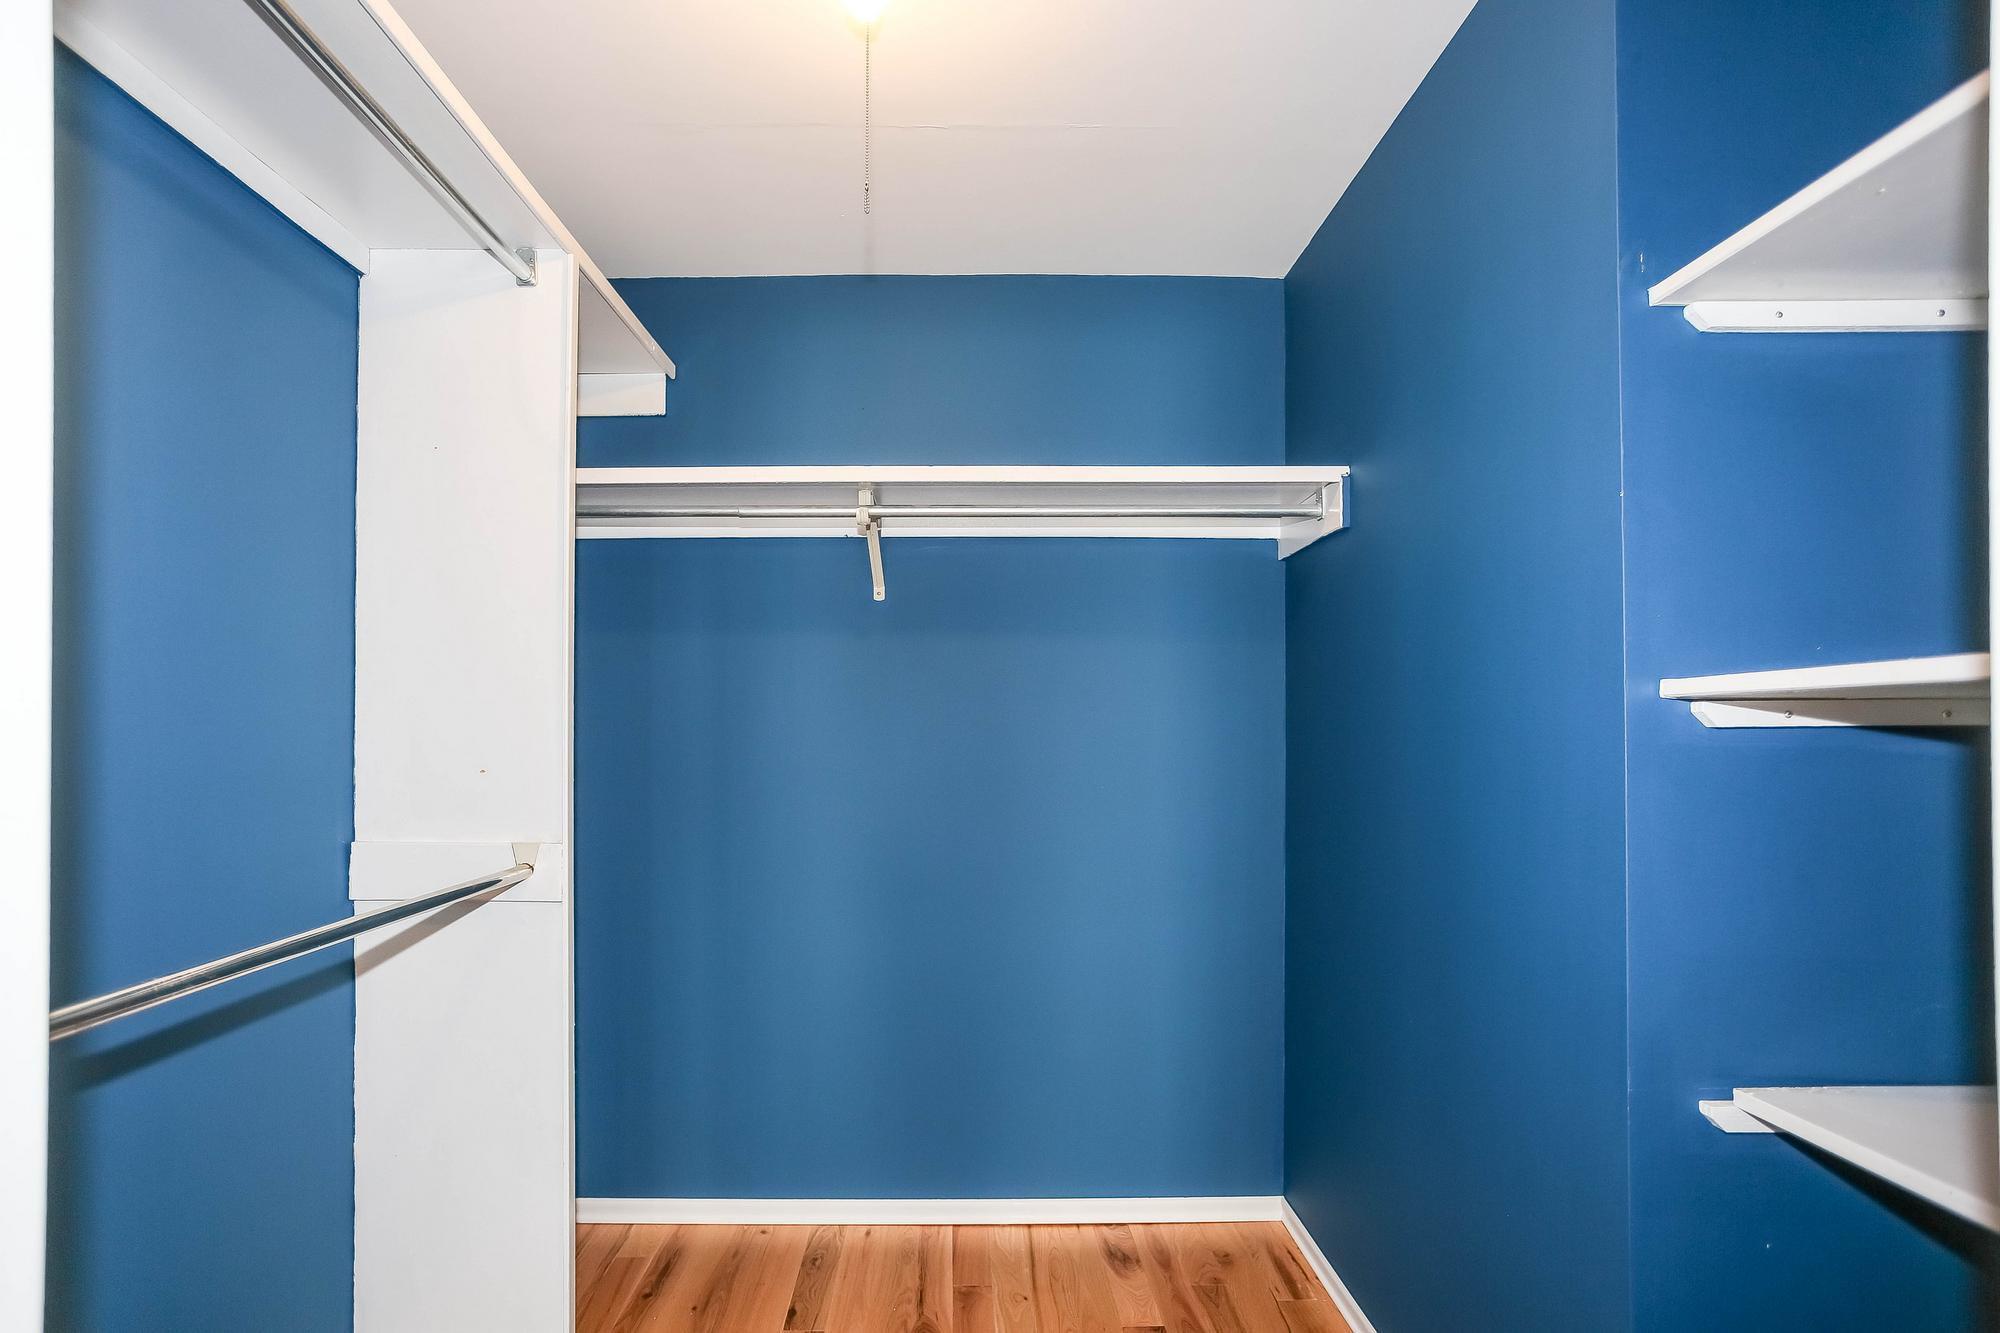 Photo 23: Photos: 155 Borebank Street in Winnipeg: River Heights Single Family Detached for sale (1C)  : MLS®# 202017166